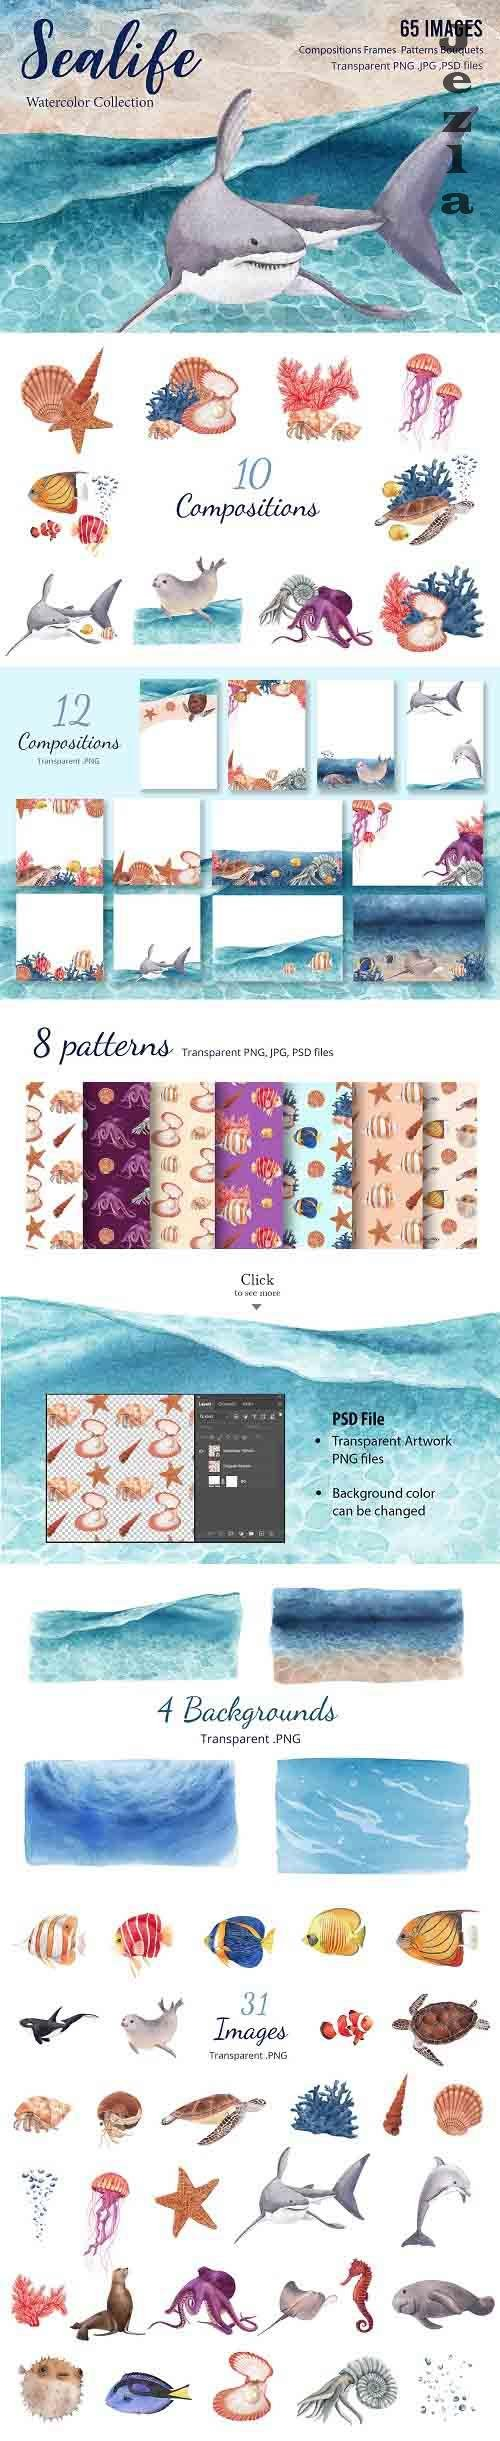 Sealife & Ocean Watercolor - 5932327